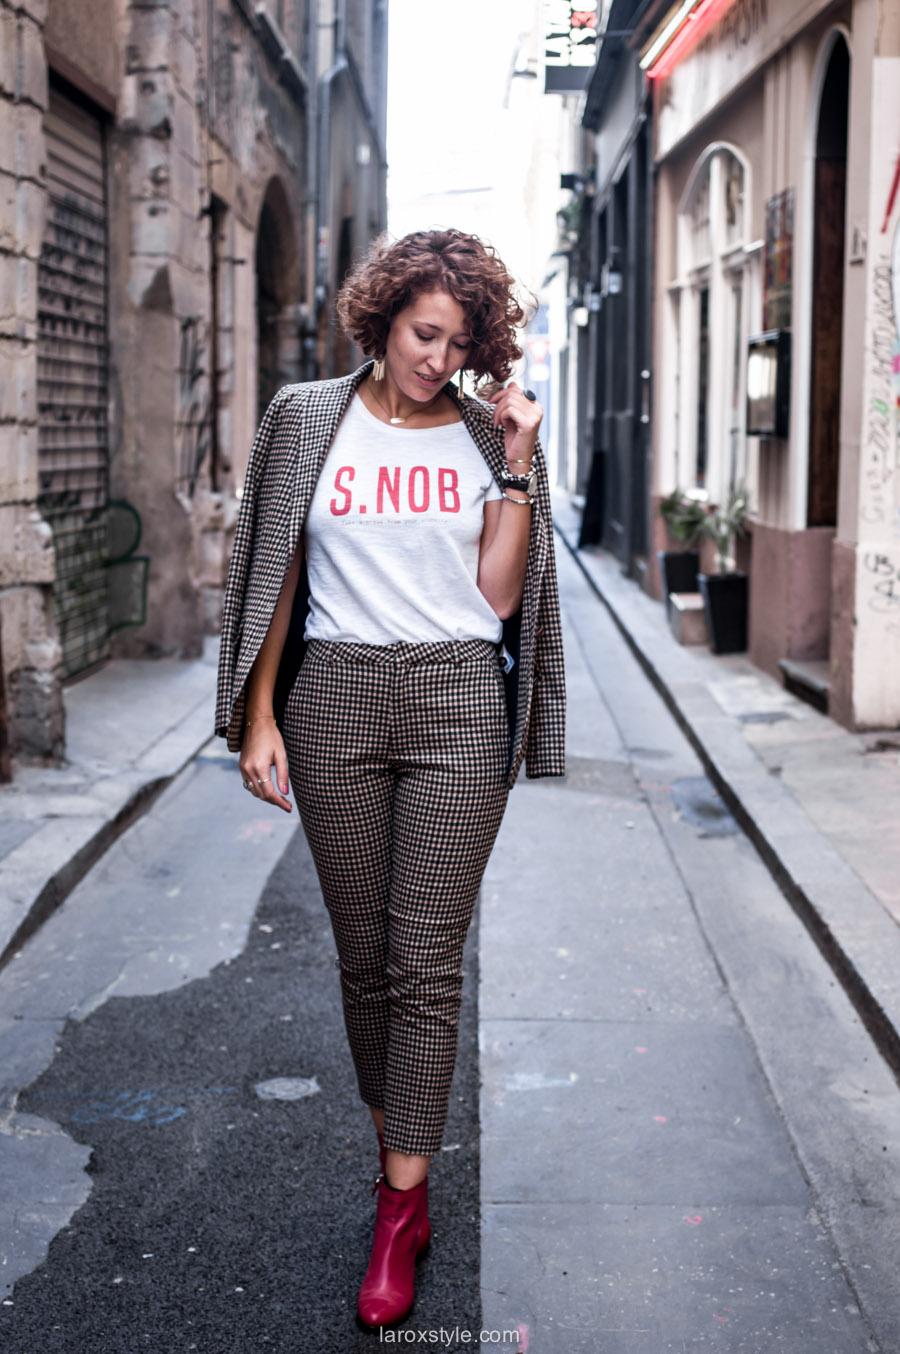 costume femme - tendance costume - t shirt message leonor roversi - SNOB - laroxstyle-3